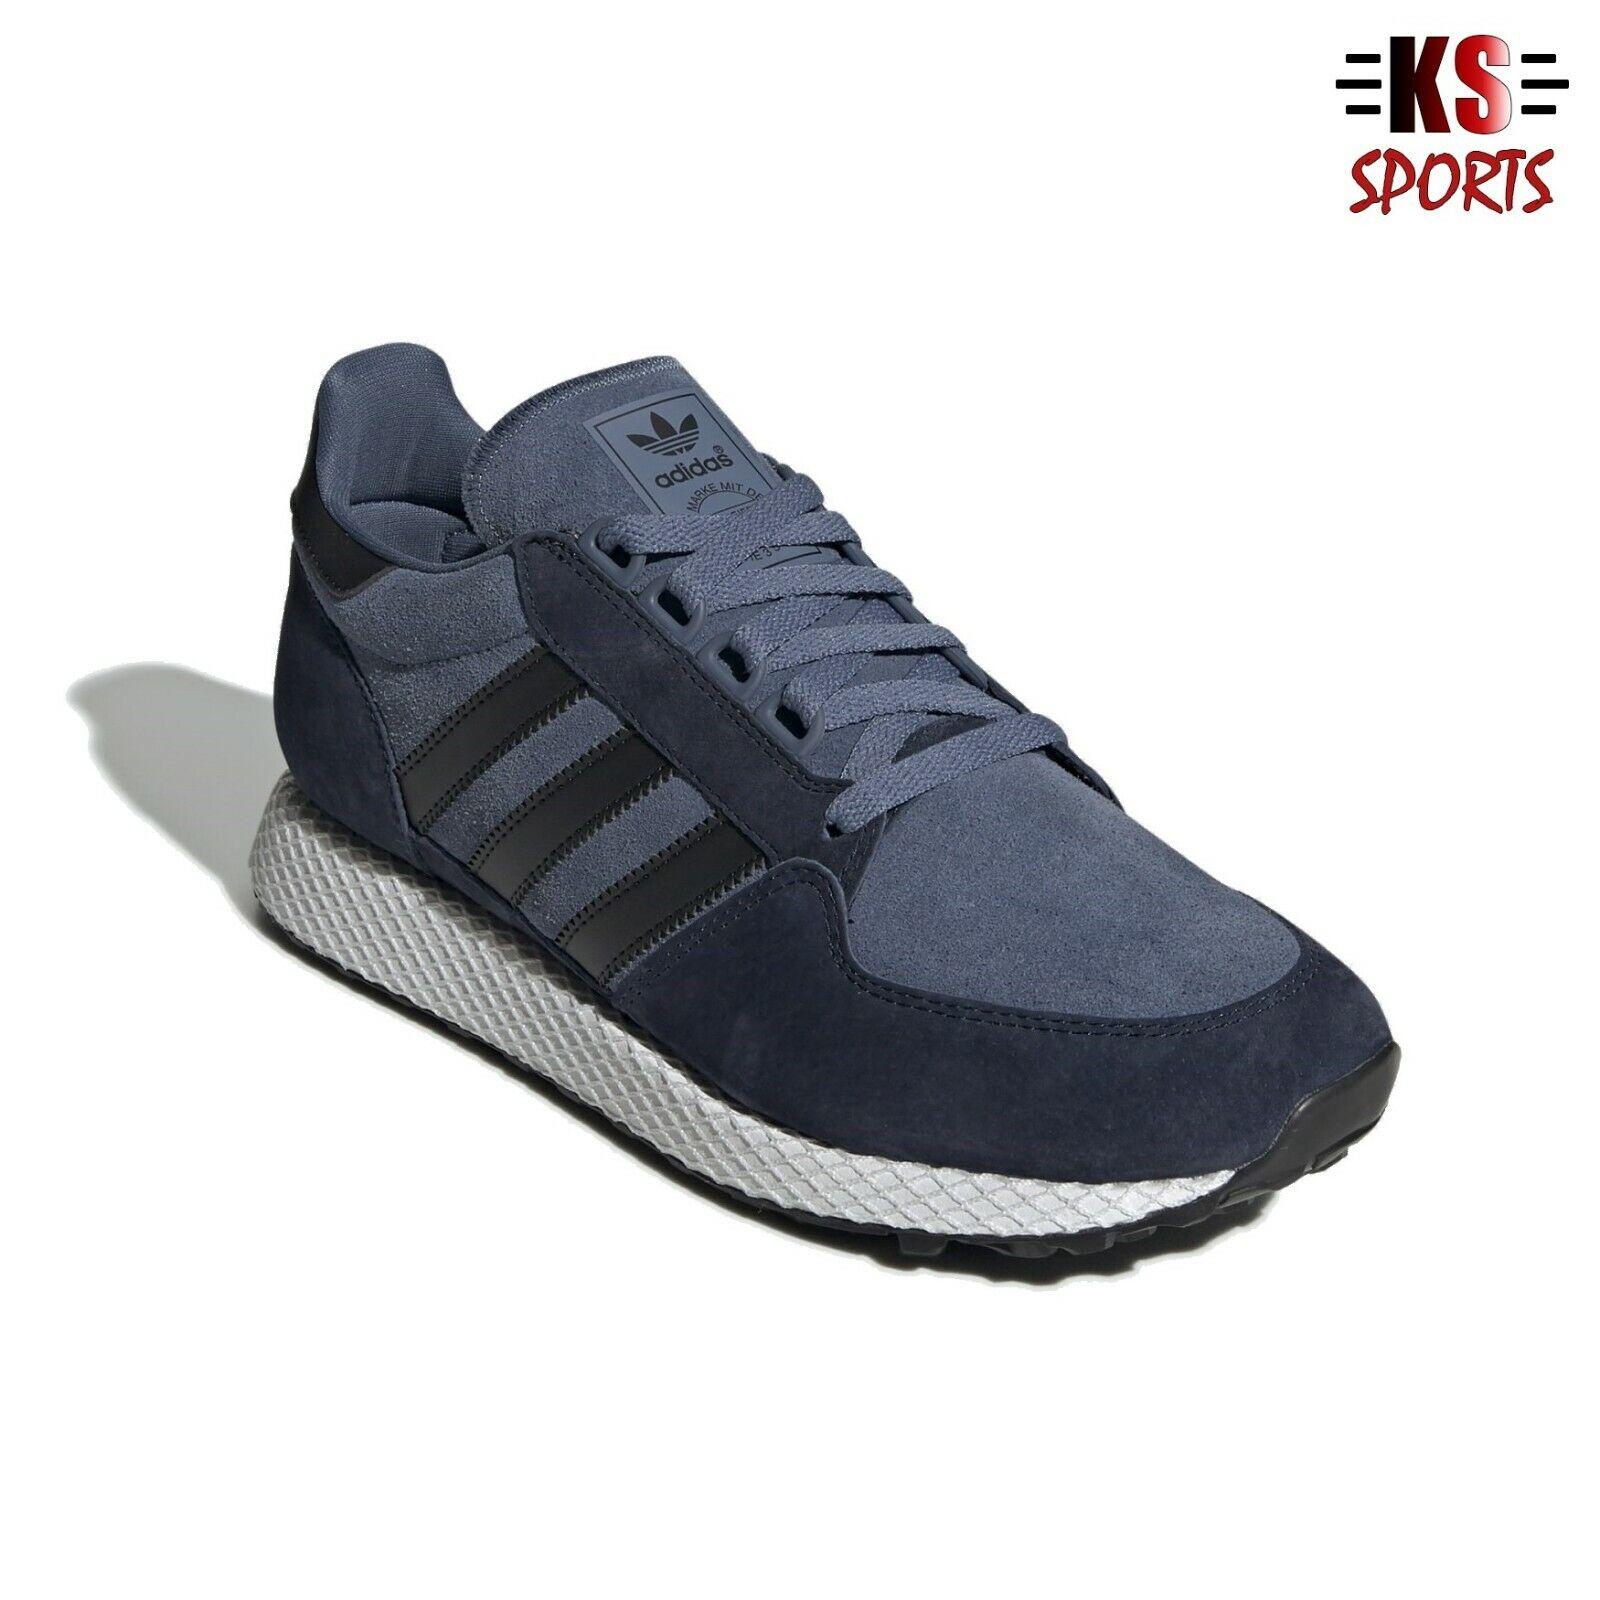 espina Odio Tomar represalias  Adidas Originals All Leather Forest Grove Men's Shoes EE8969 | eBay